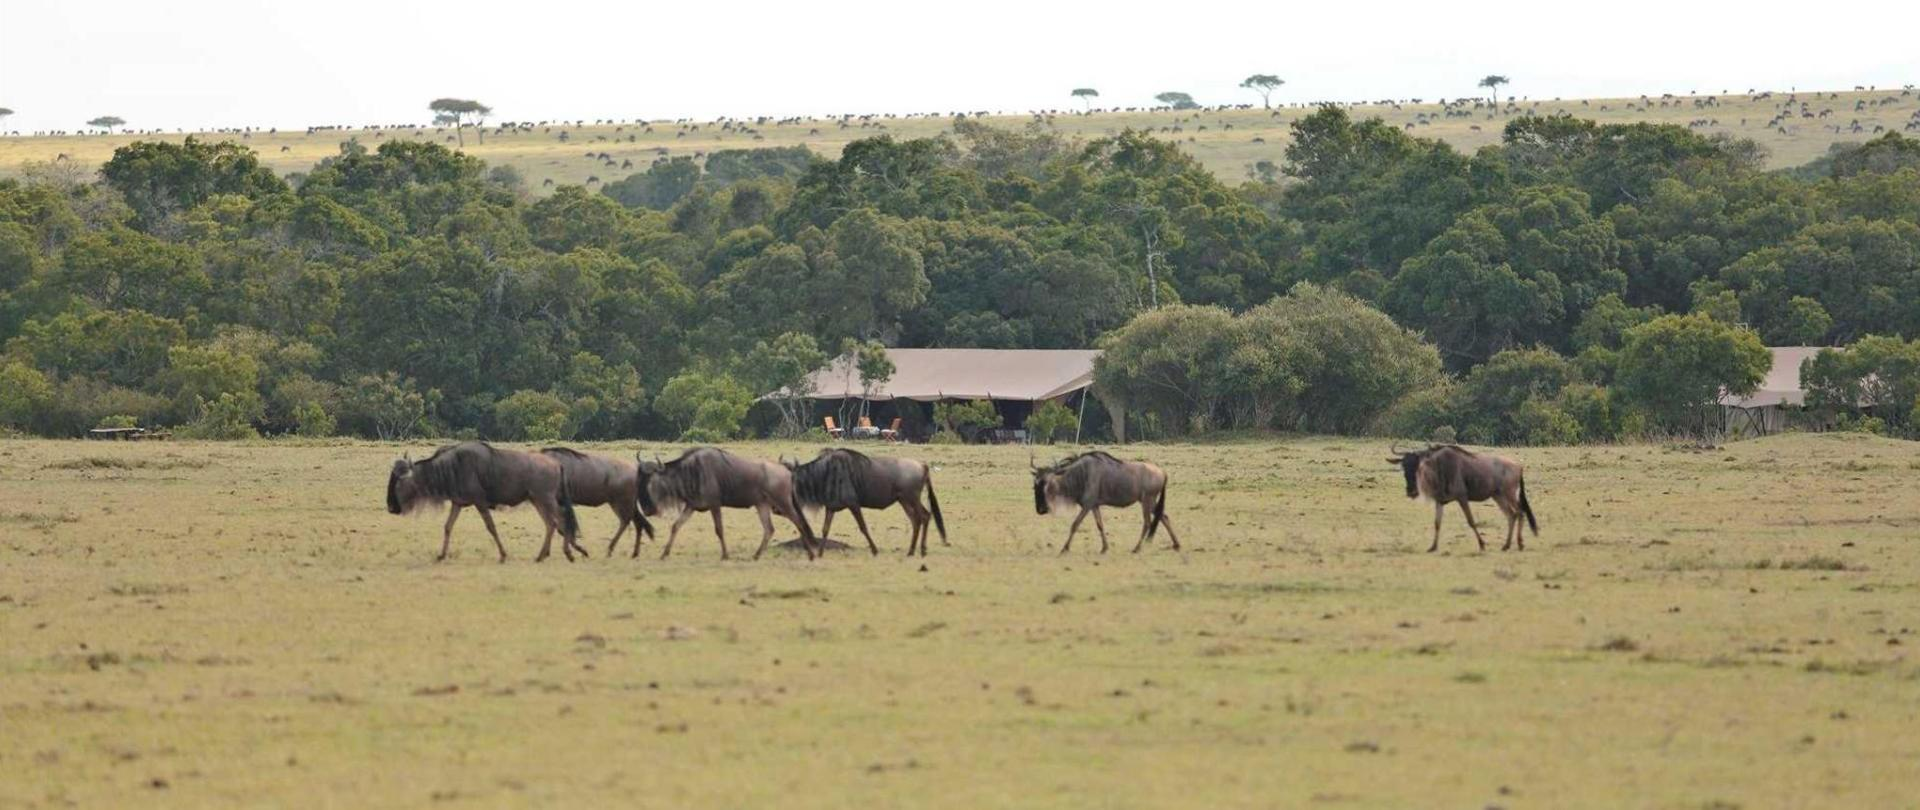 saruni-wld-gnu-and-zebra-surround-us.jpg